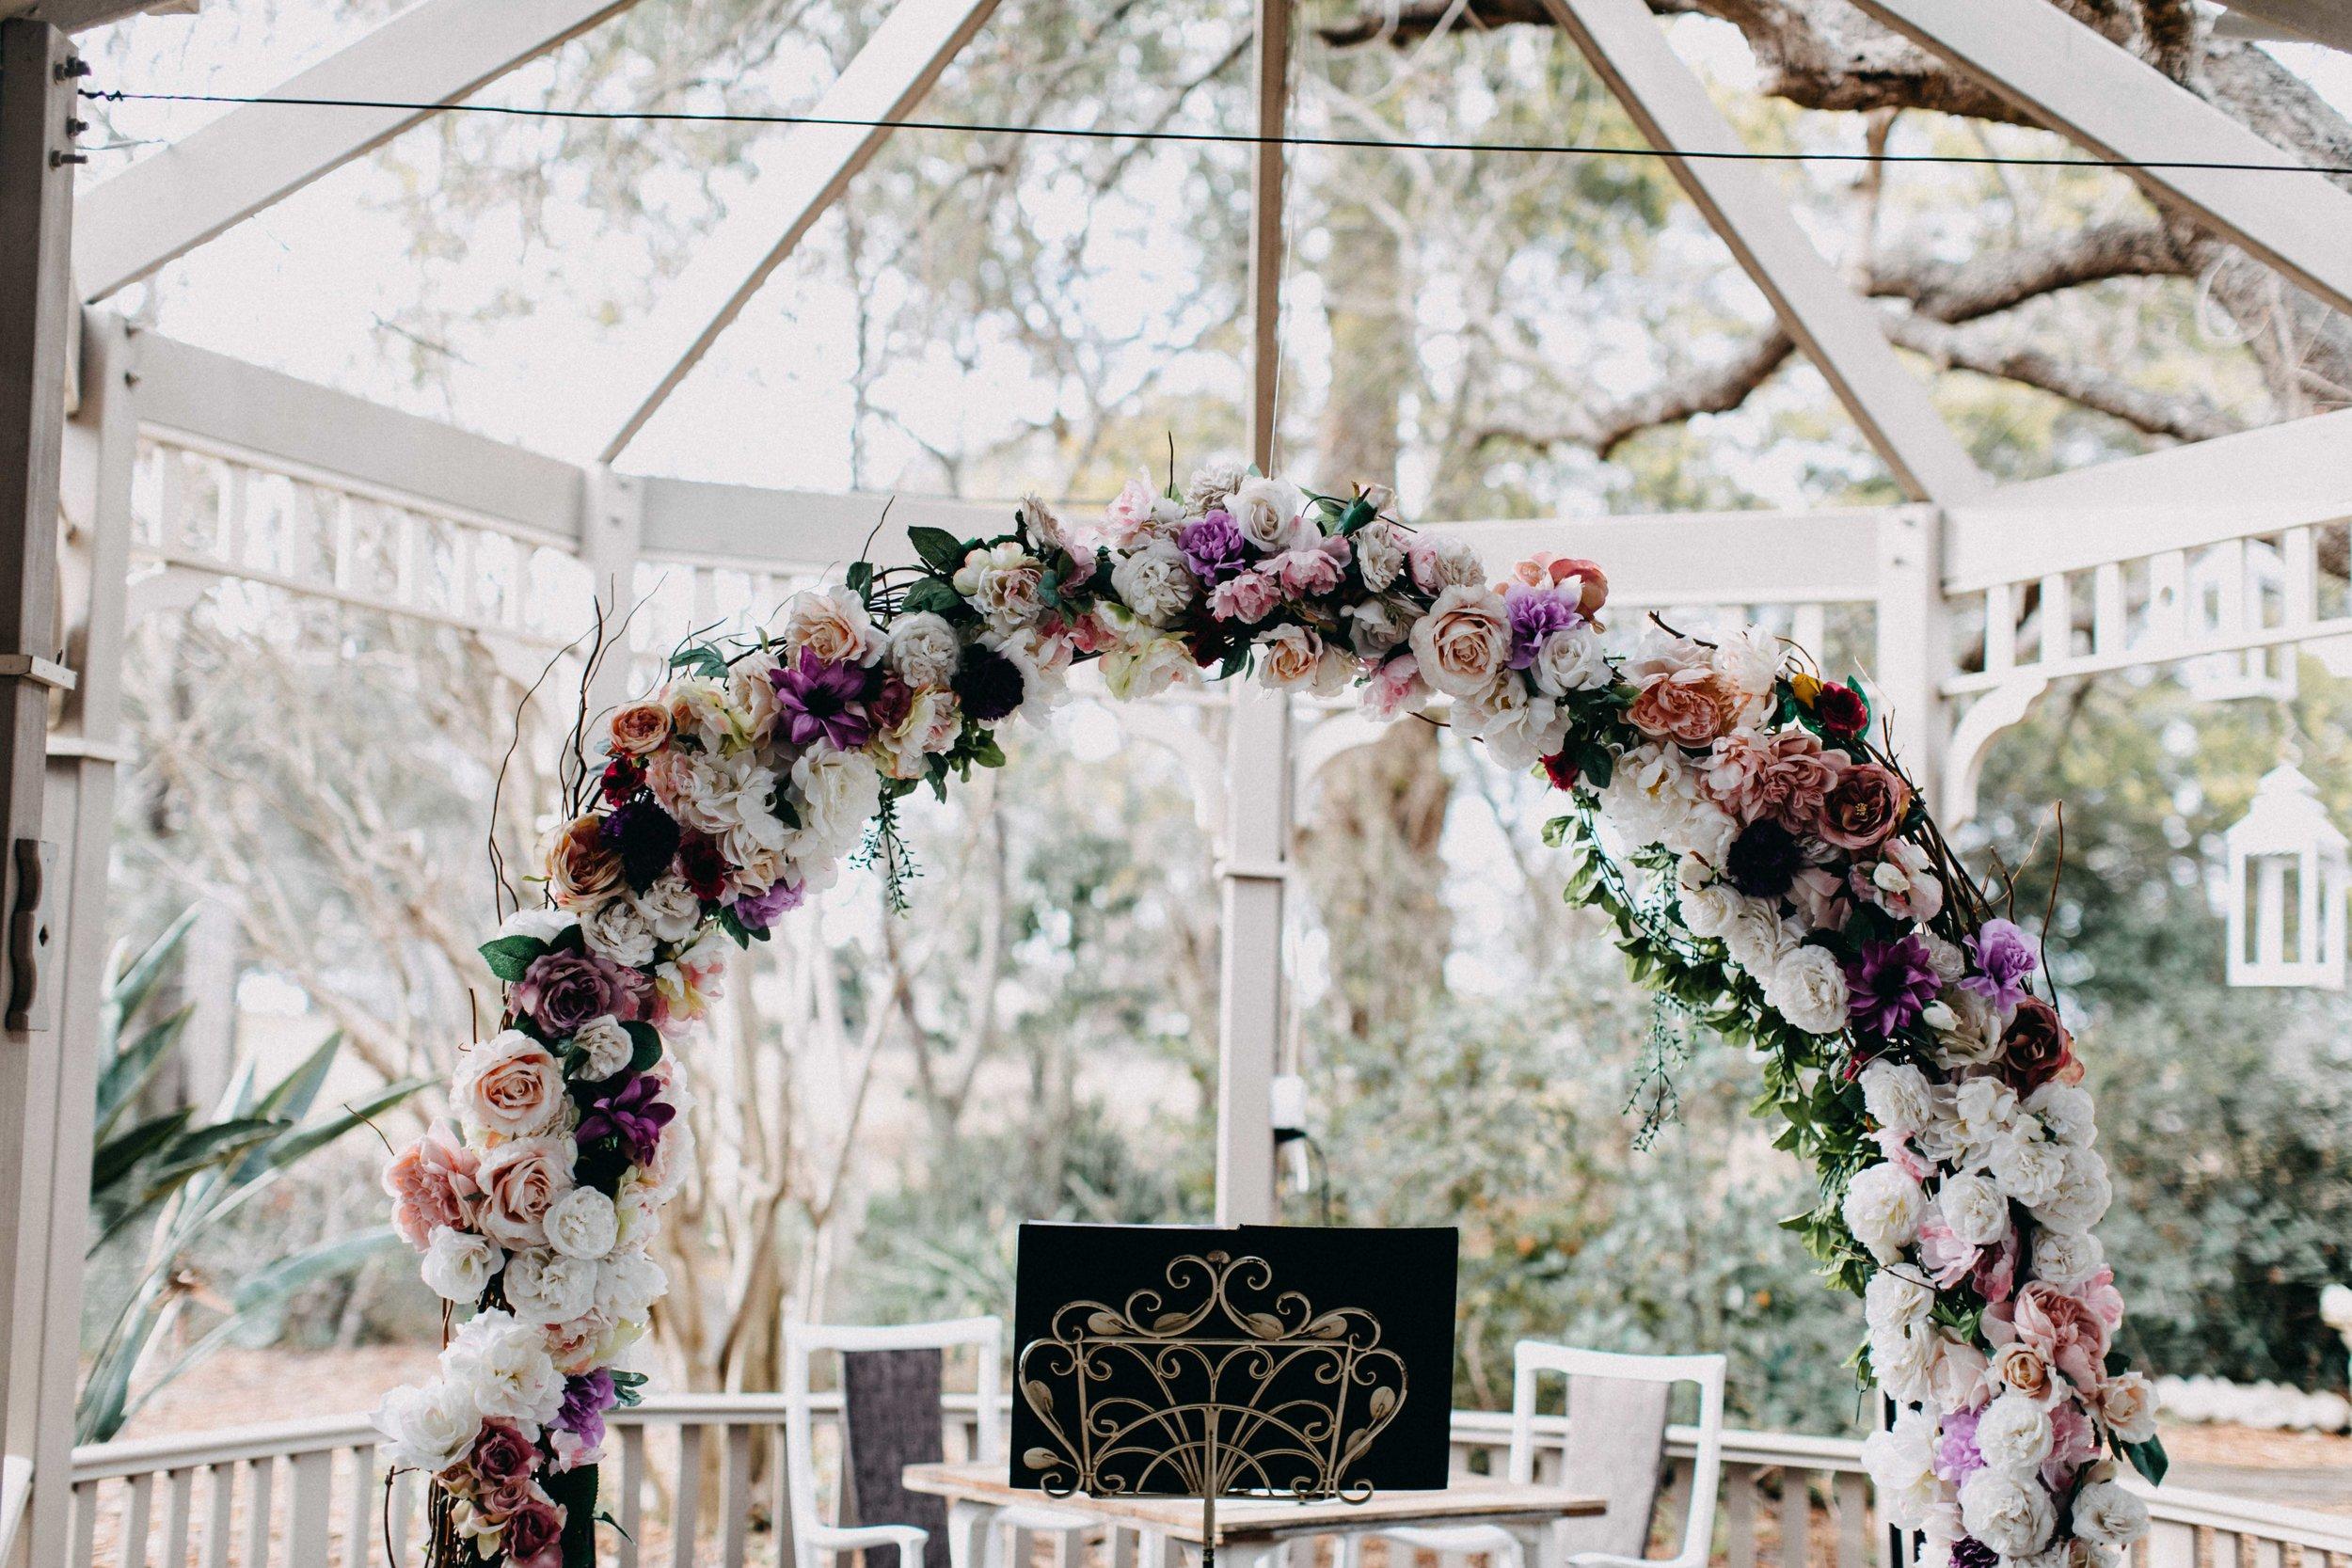 appin-house-wedding-macarthur-www.emilyobrienphotography.net-51.jpg